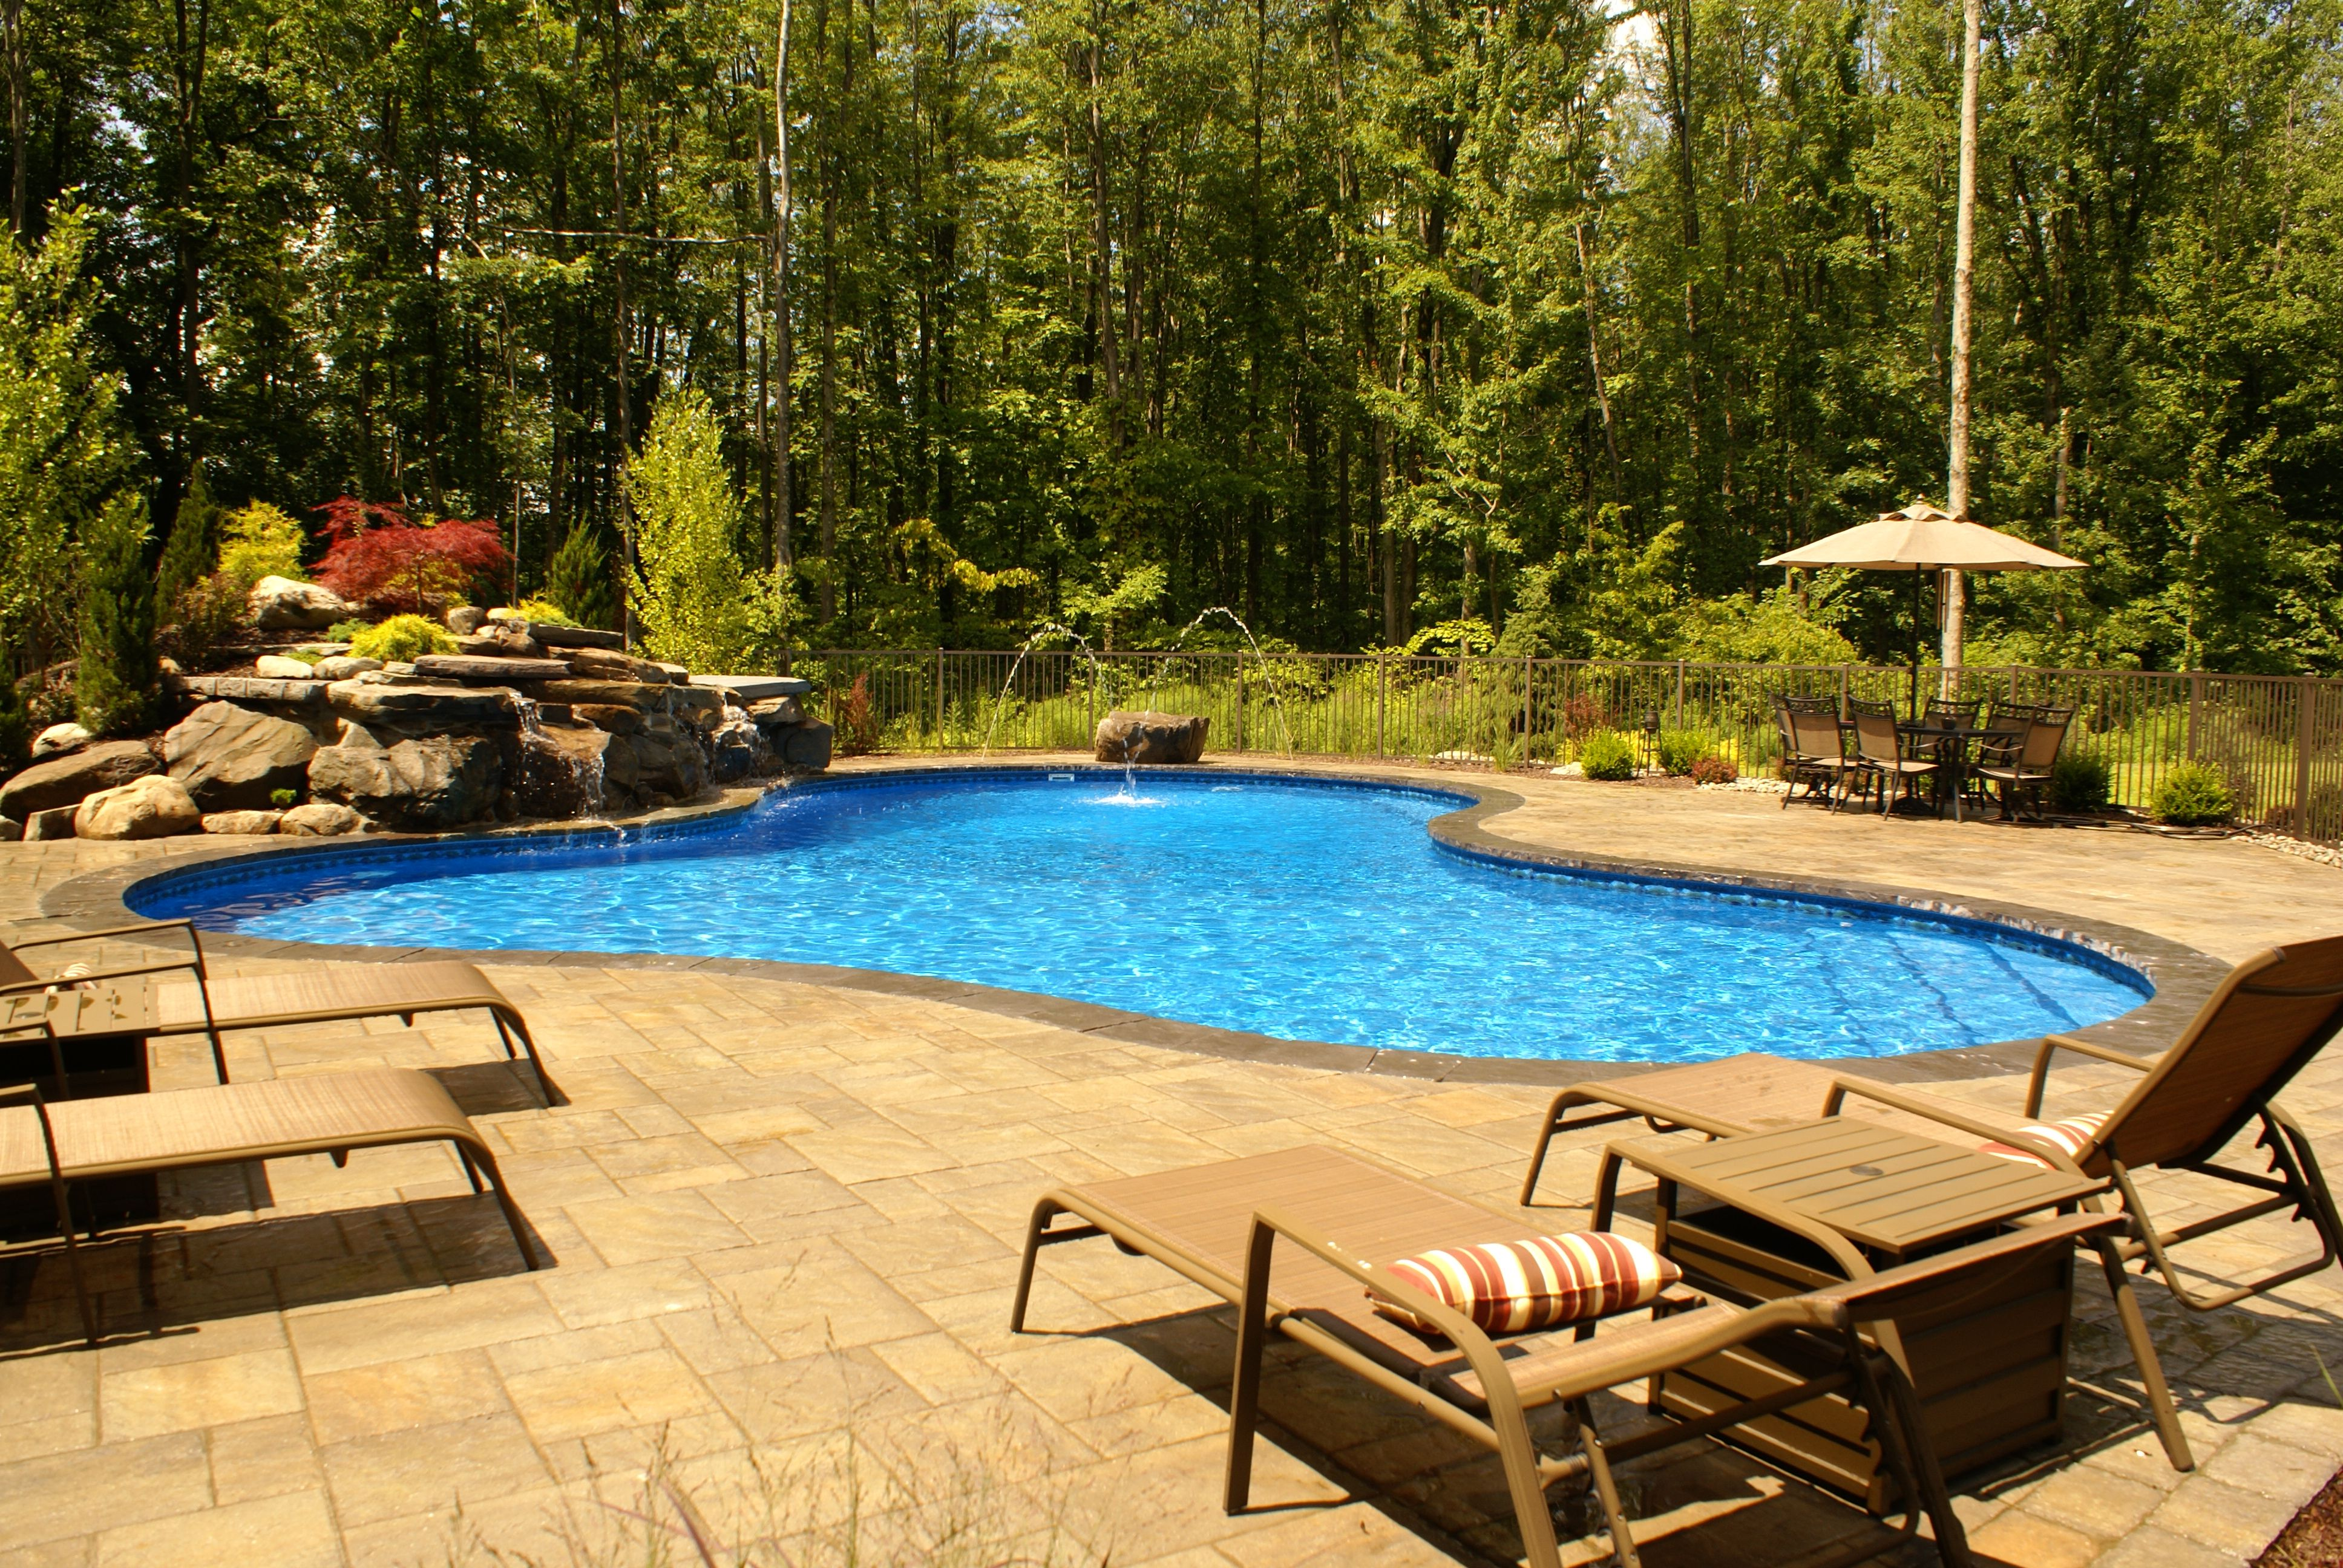 Freeform lagoon pool, hand built waterfall, rock diving board ...